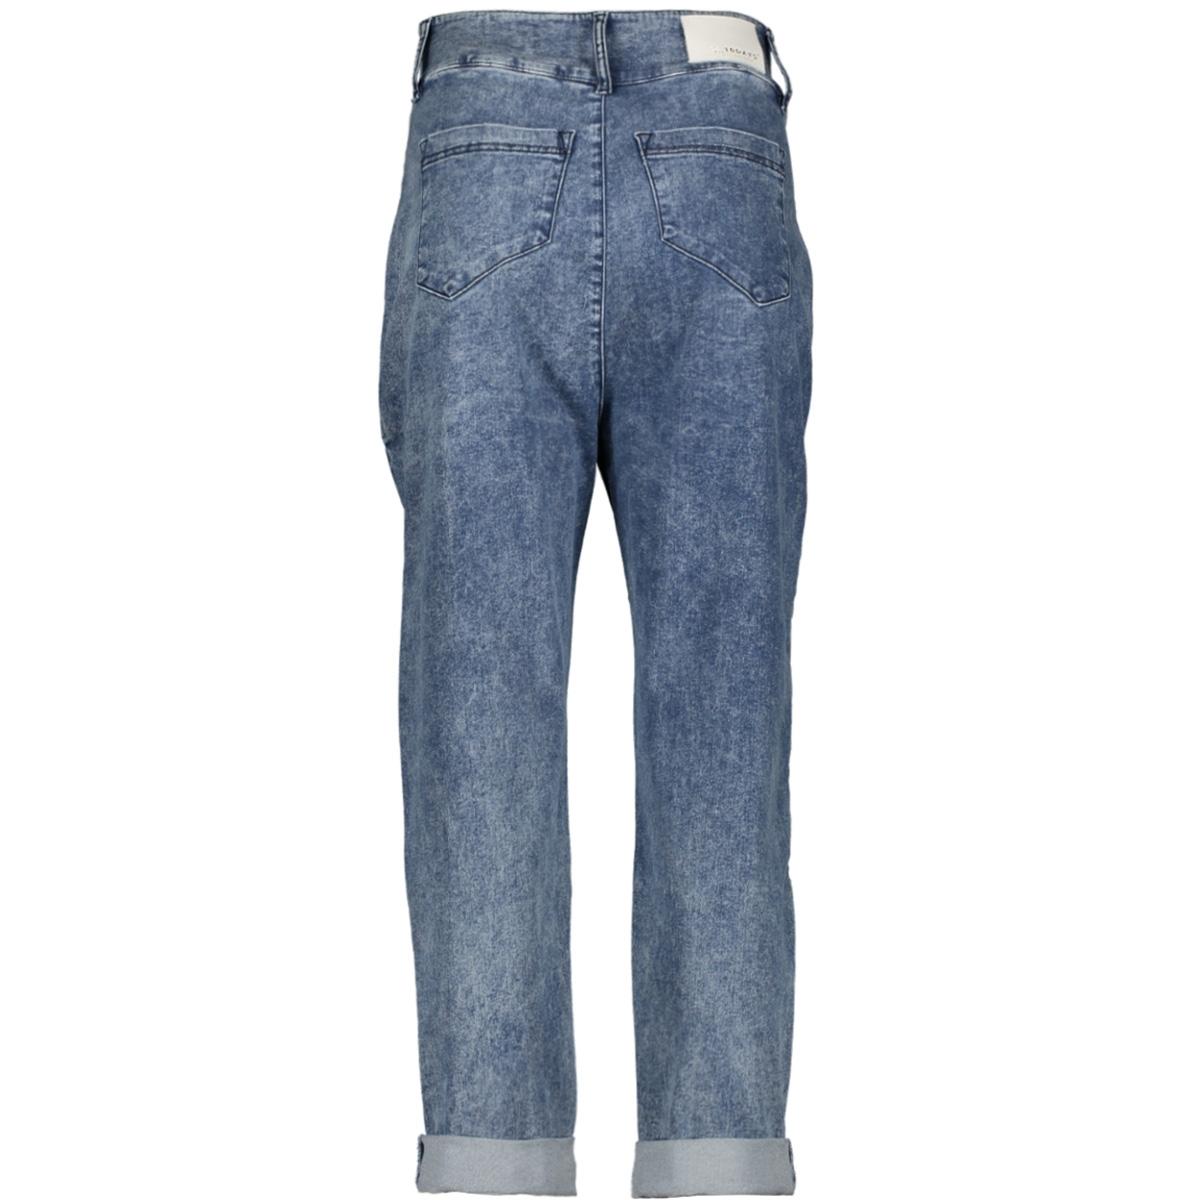 high waist denim 20 061 0203 10 days jeans 1082 blue